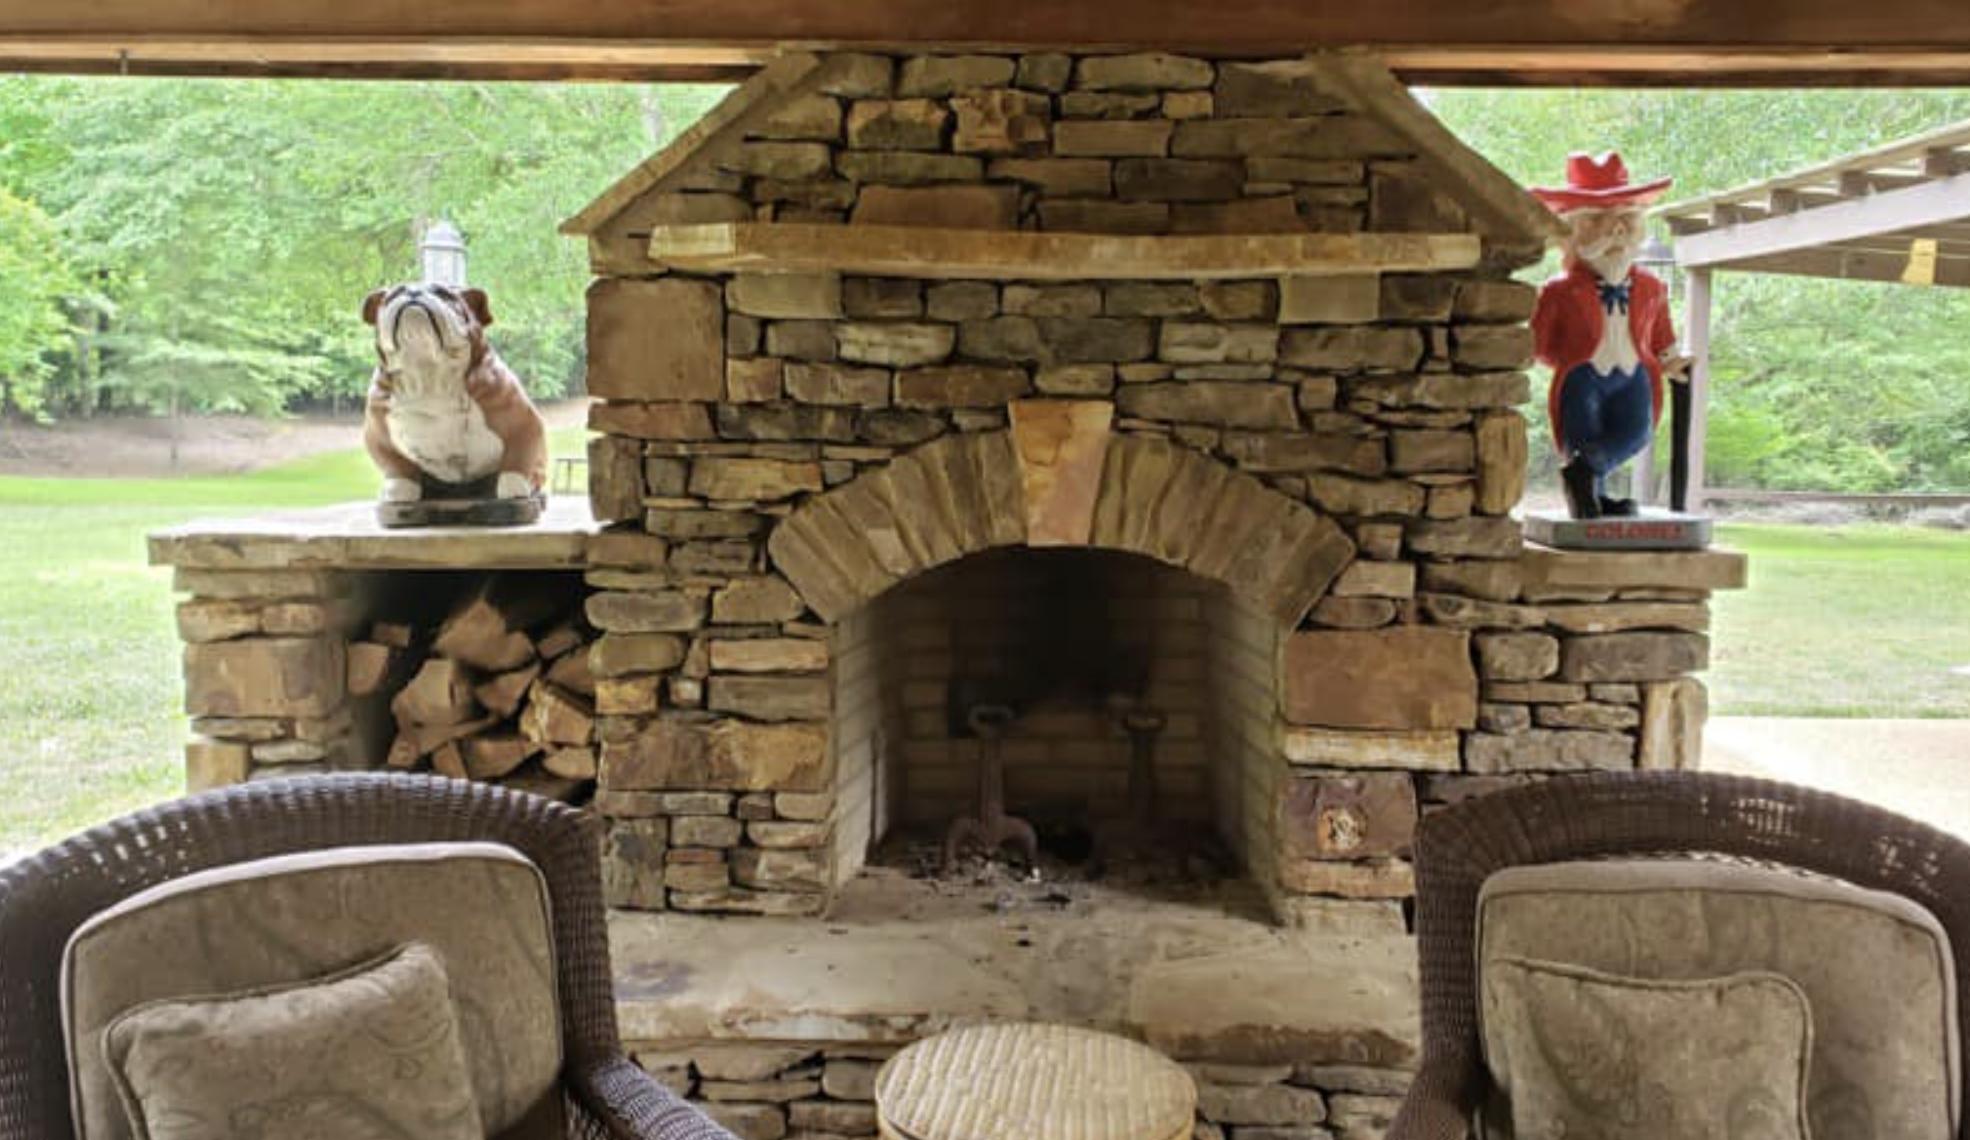 this image shows fireplace in Cerritos, California